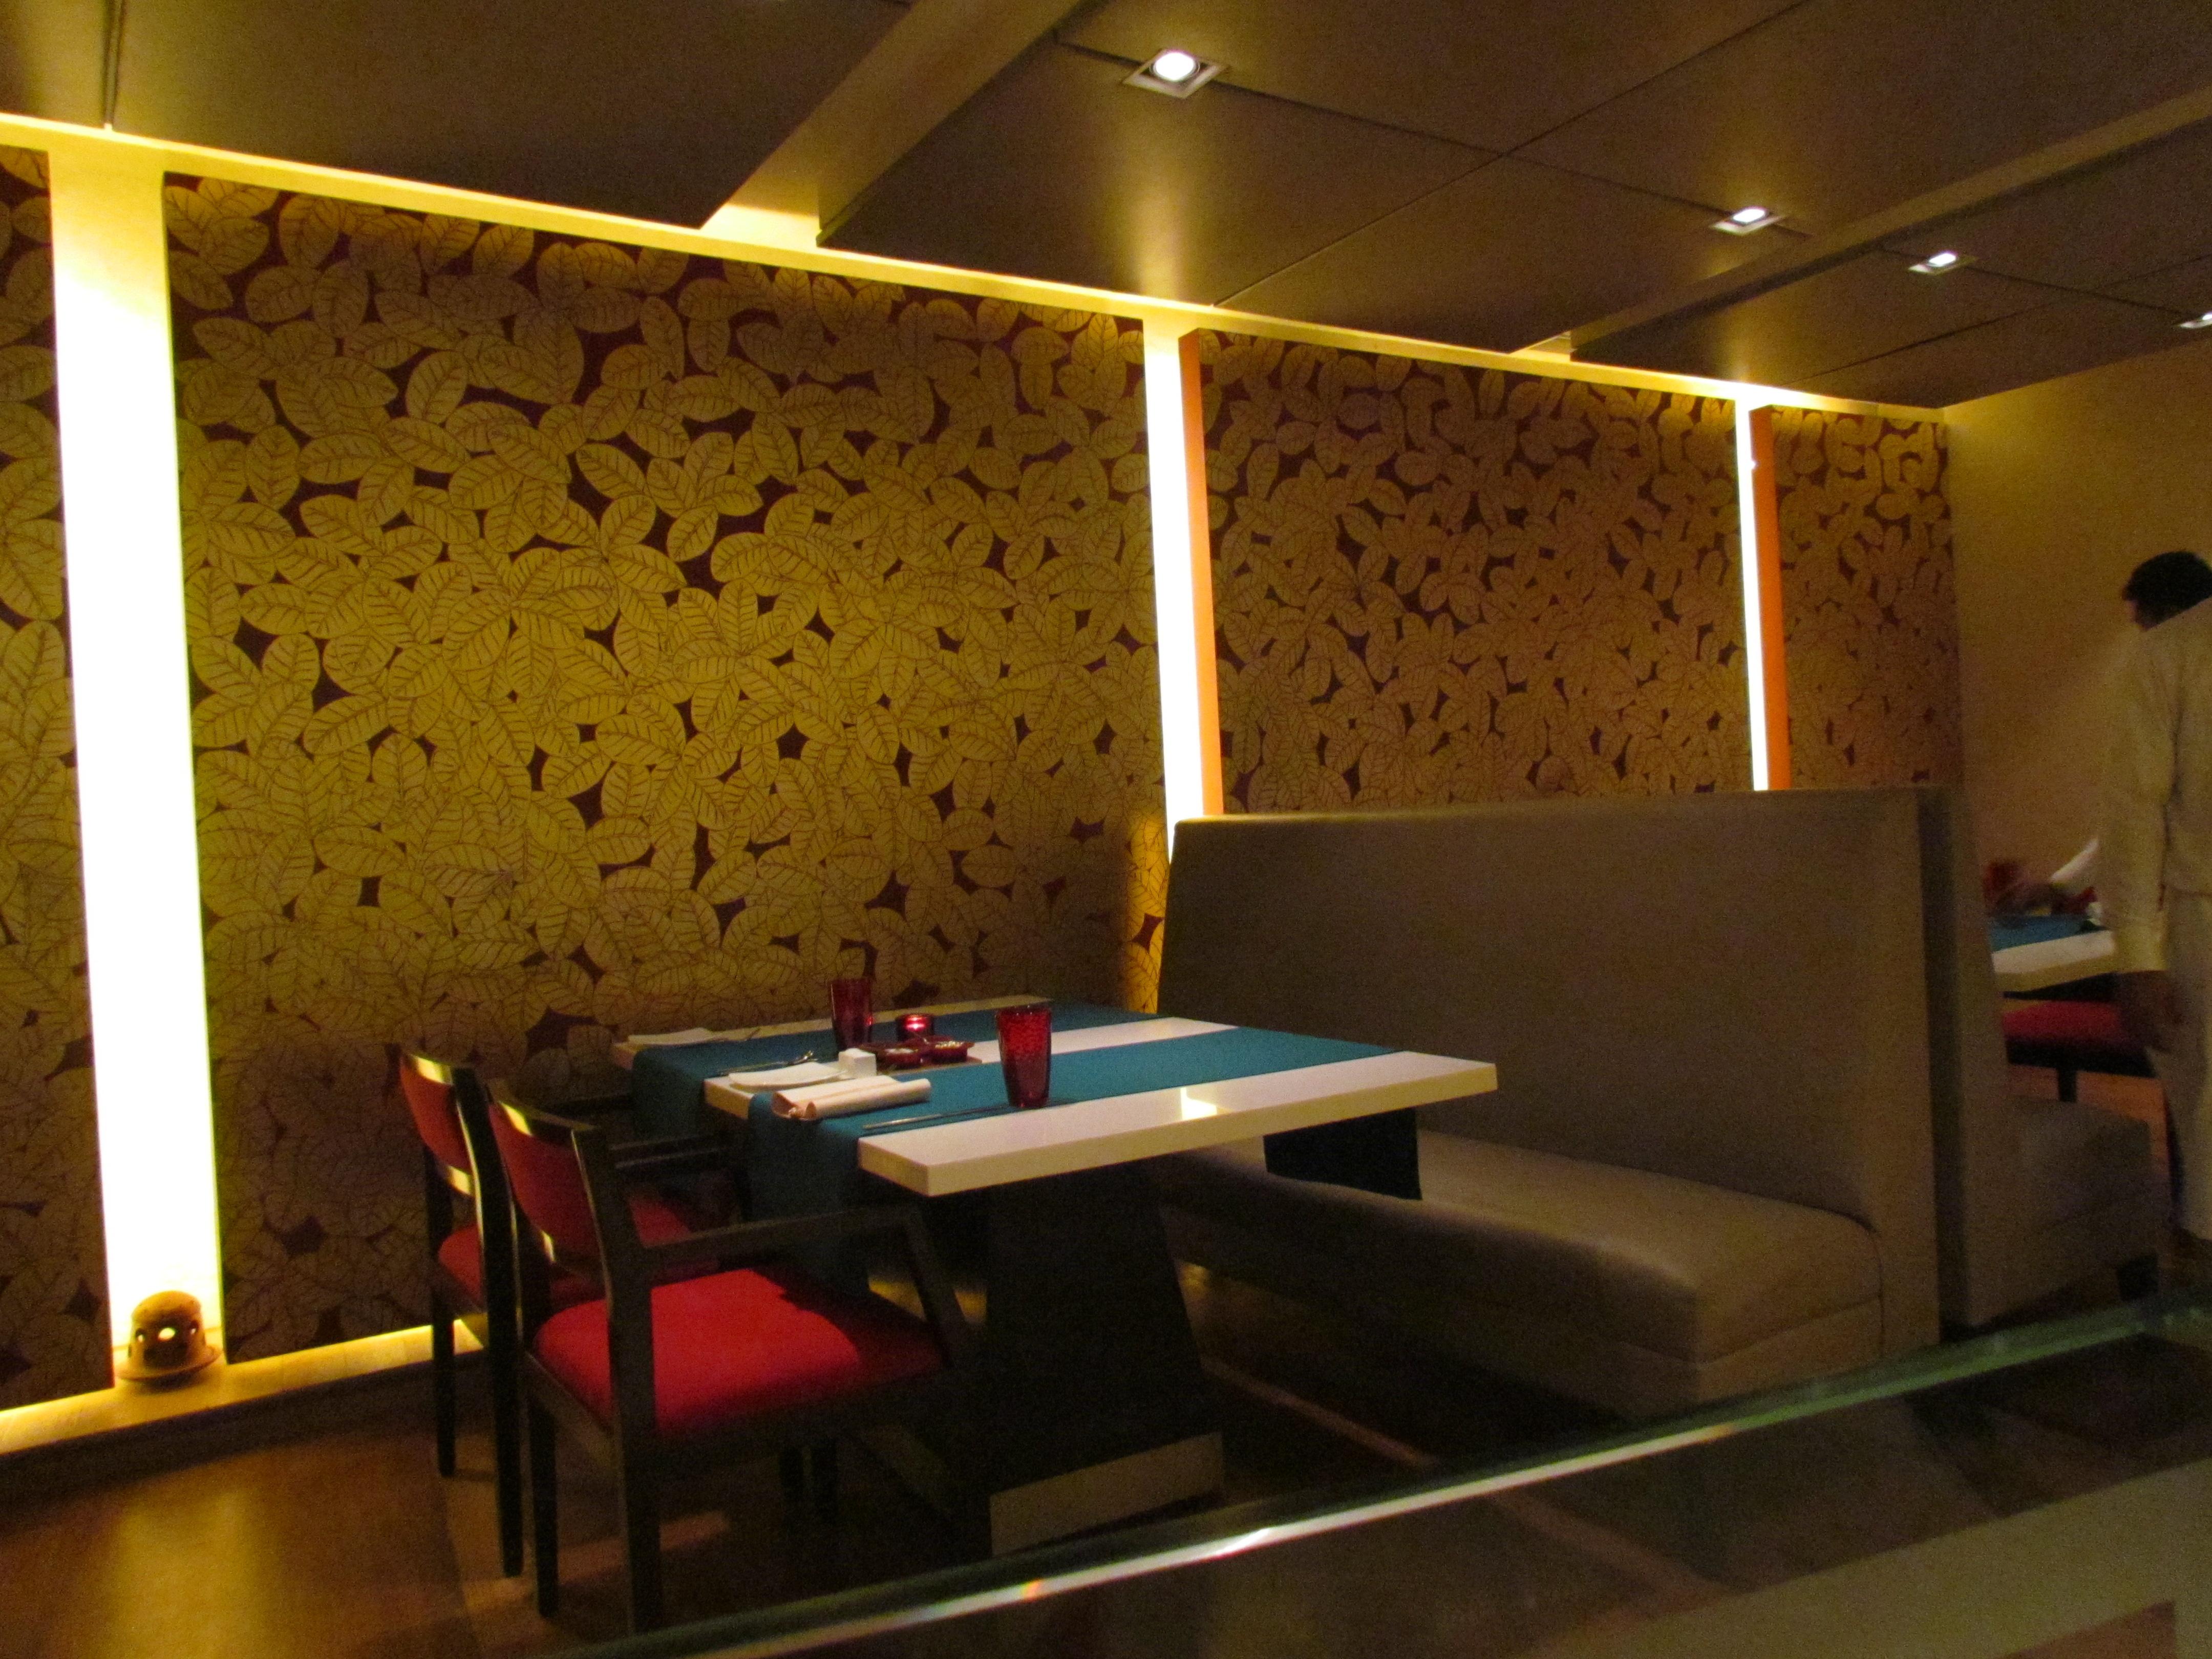 Maya Trident Hotel C 56 G Block Bandra Kurla Complex  : img8284 from yummraj.com size 4320 x 3240 jpeg 3314kB